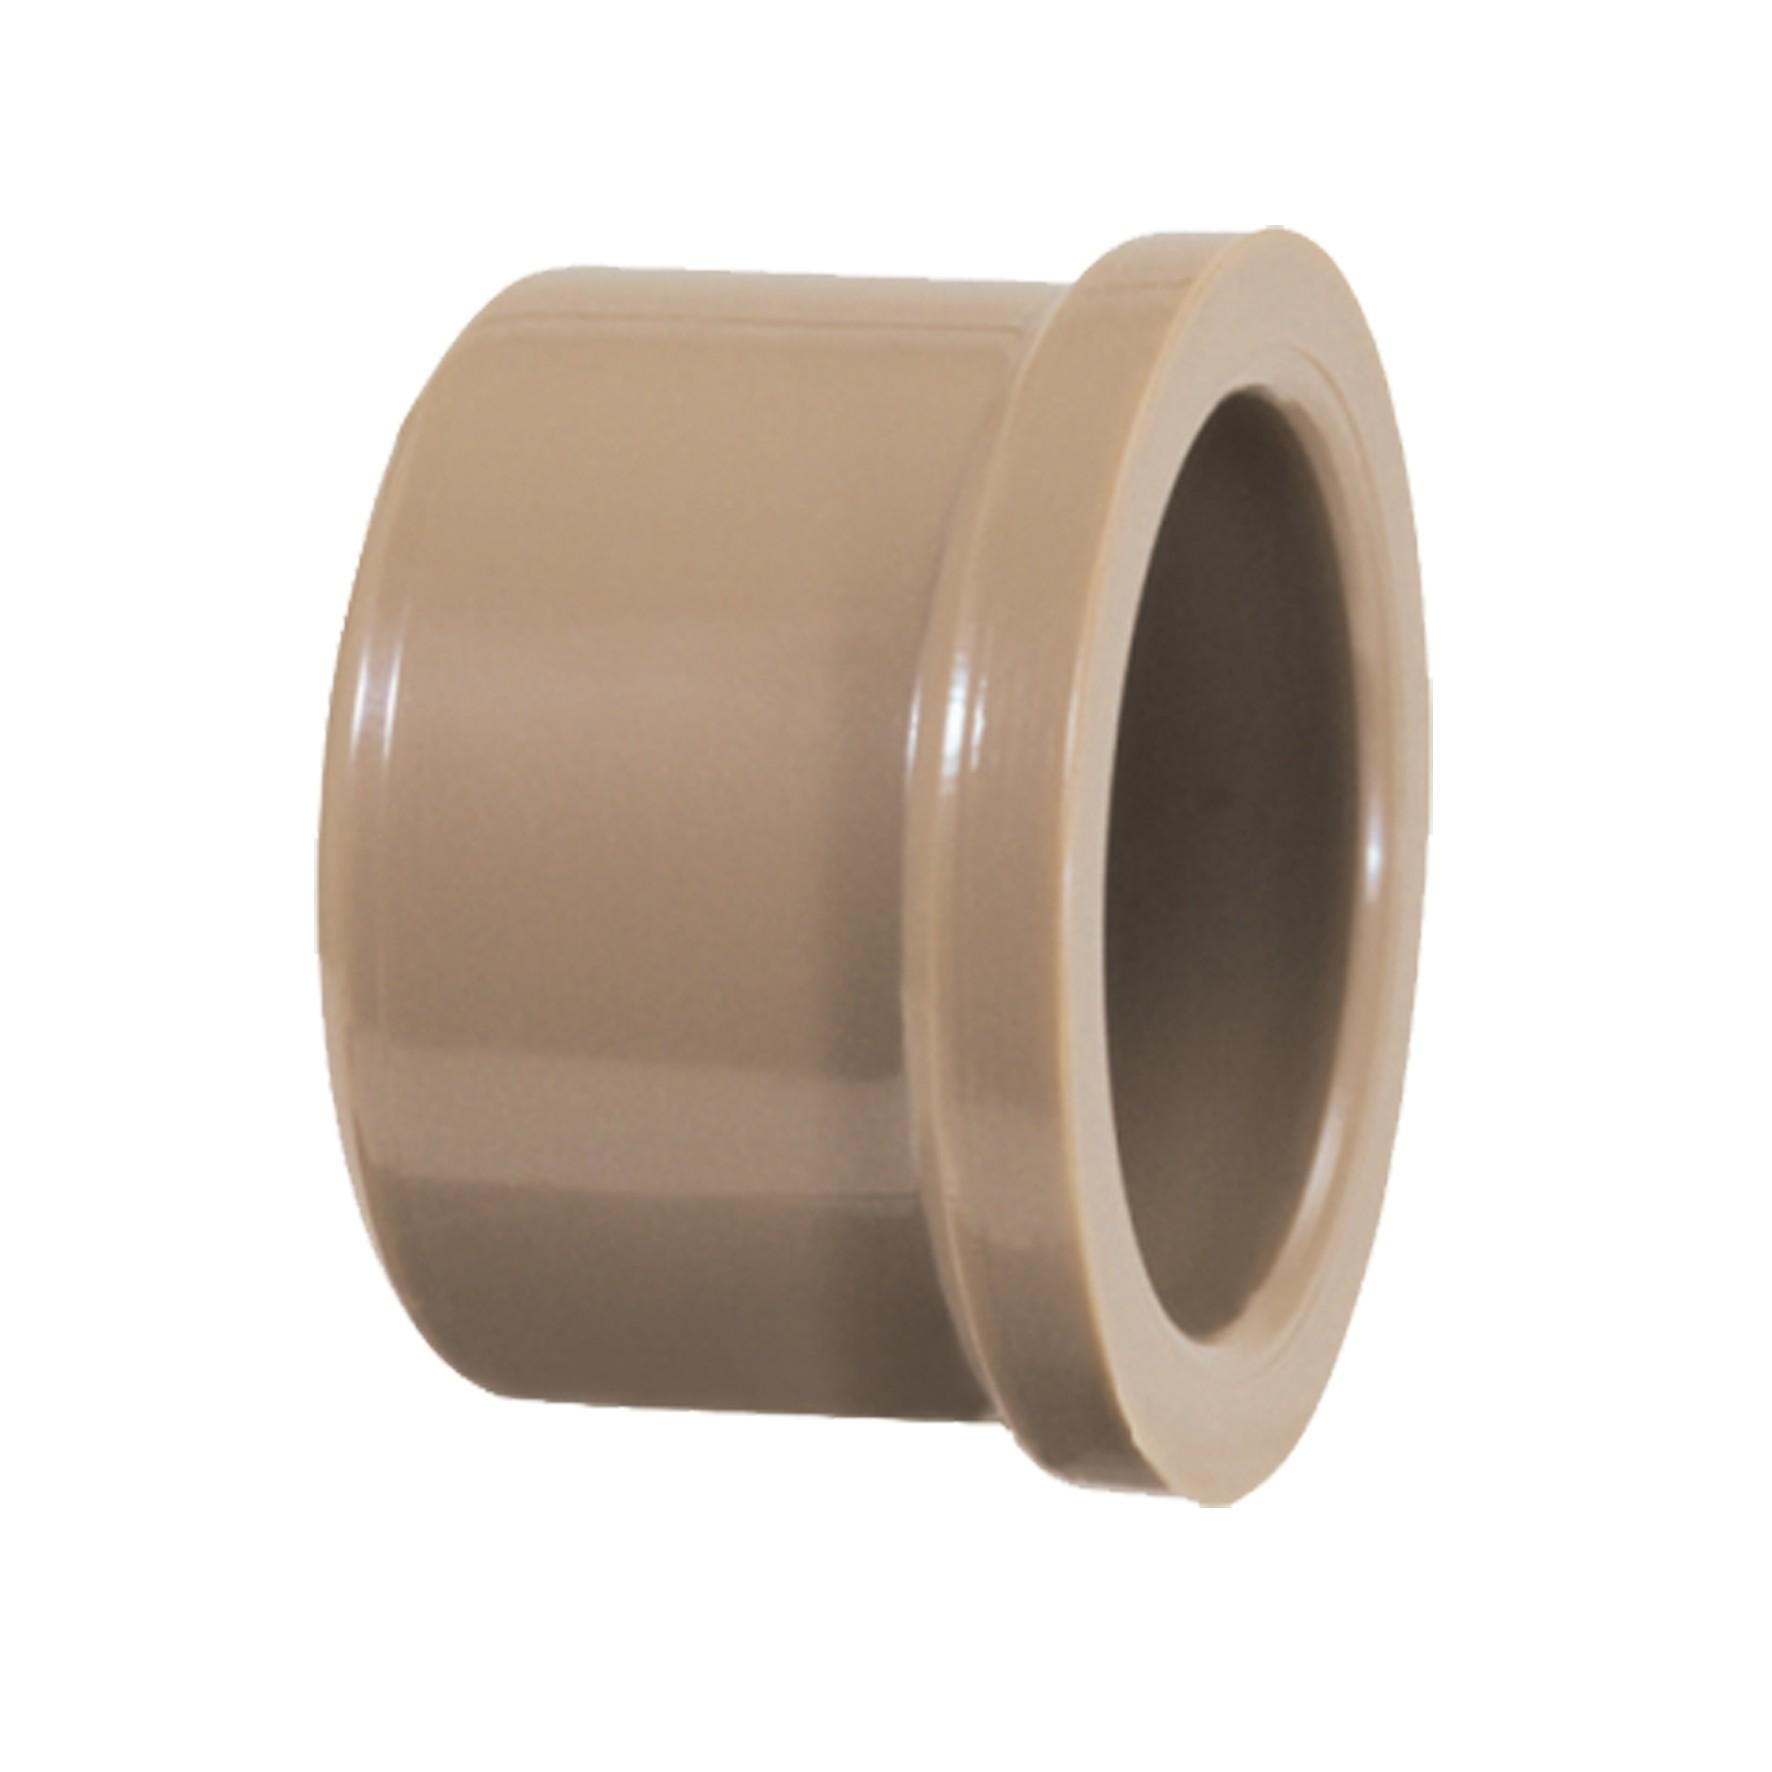 Cap Simples Soldavel PVC 40mm - Krona